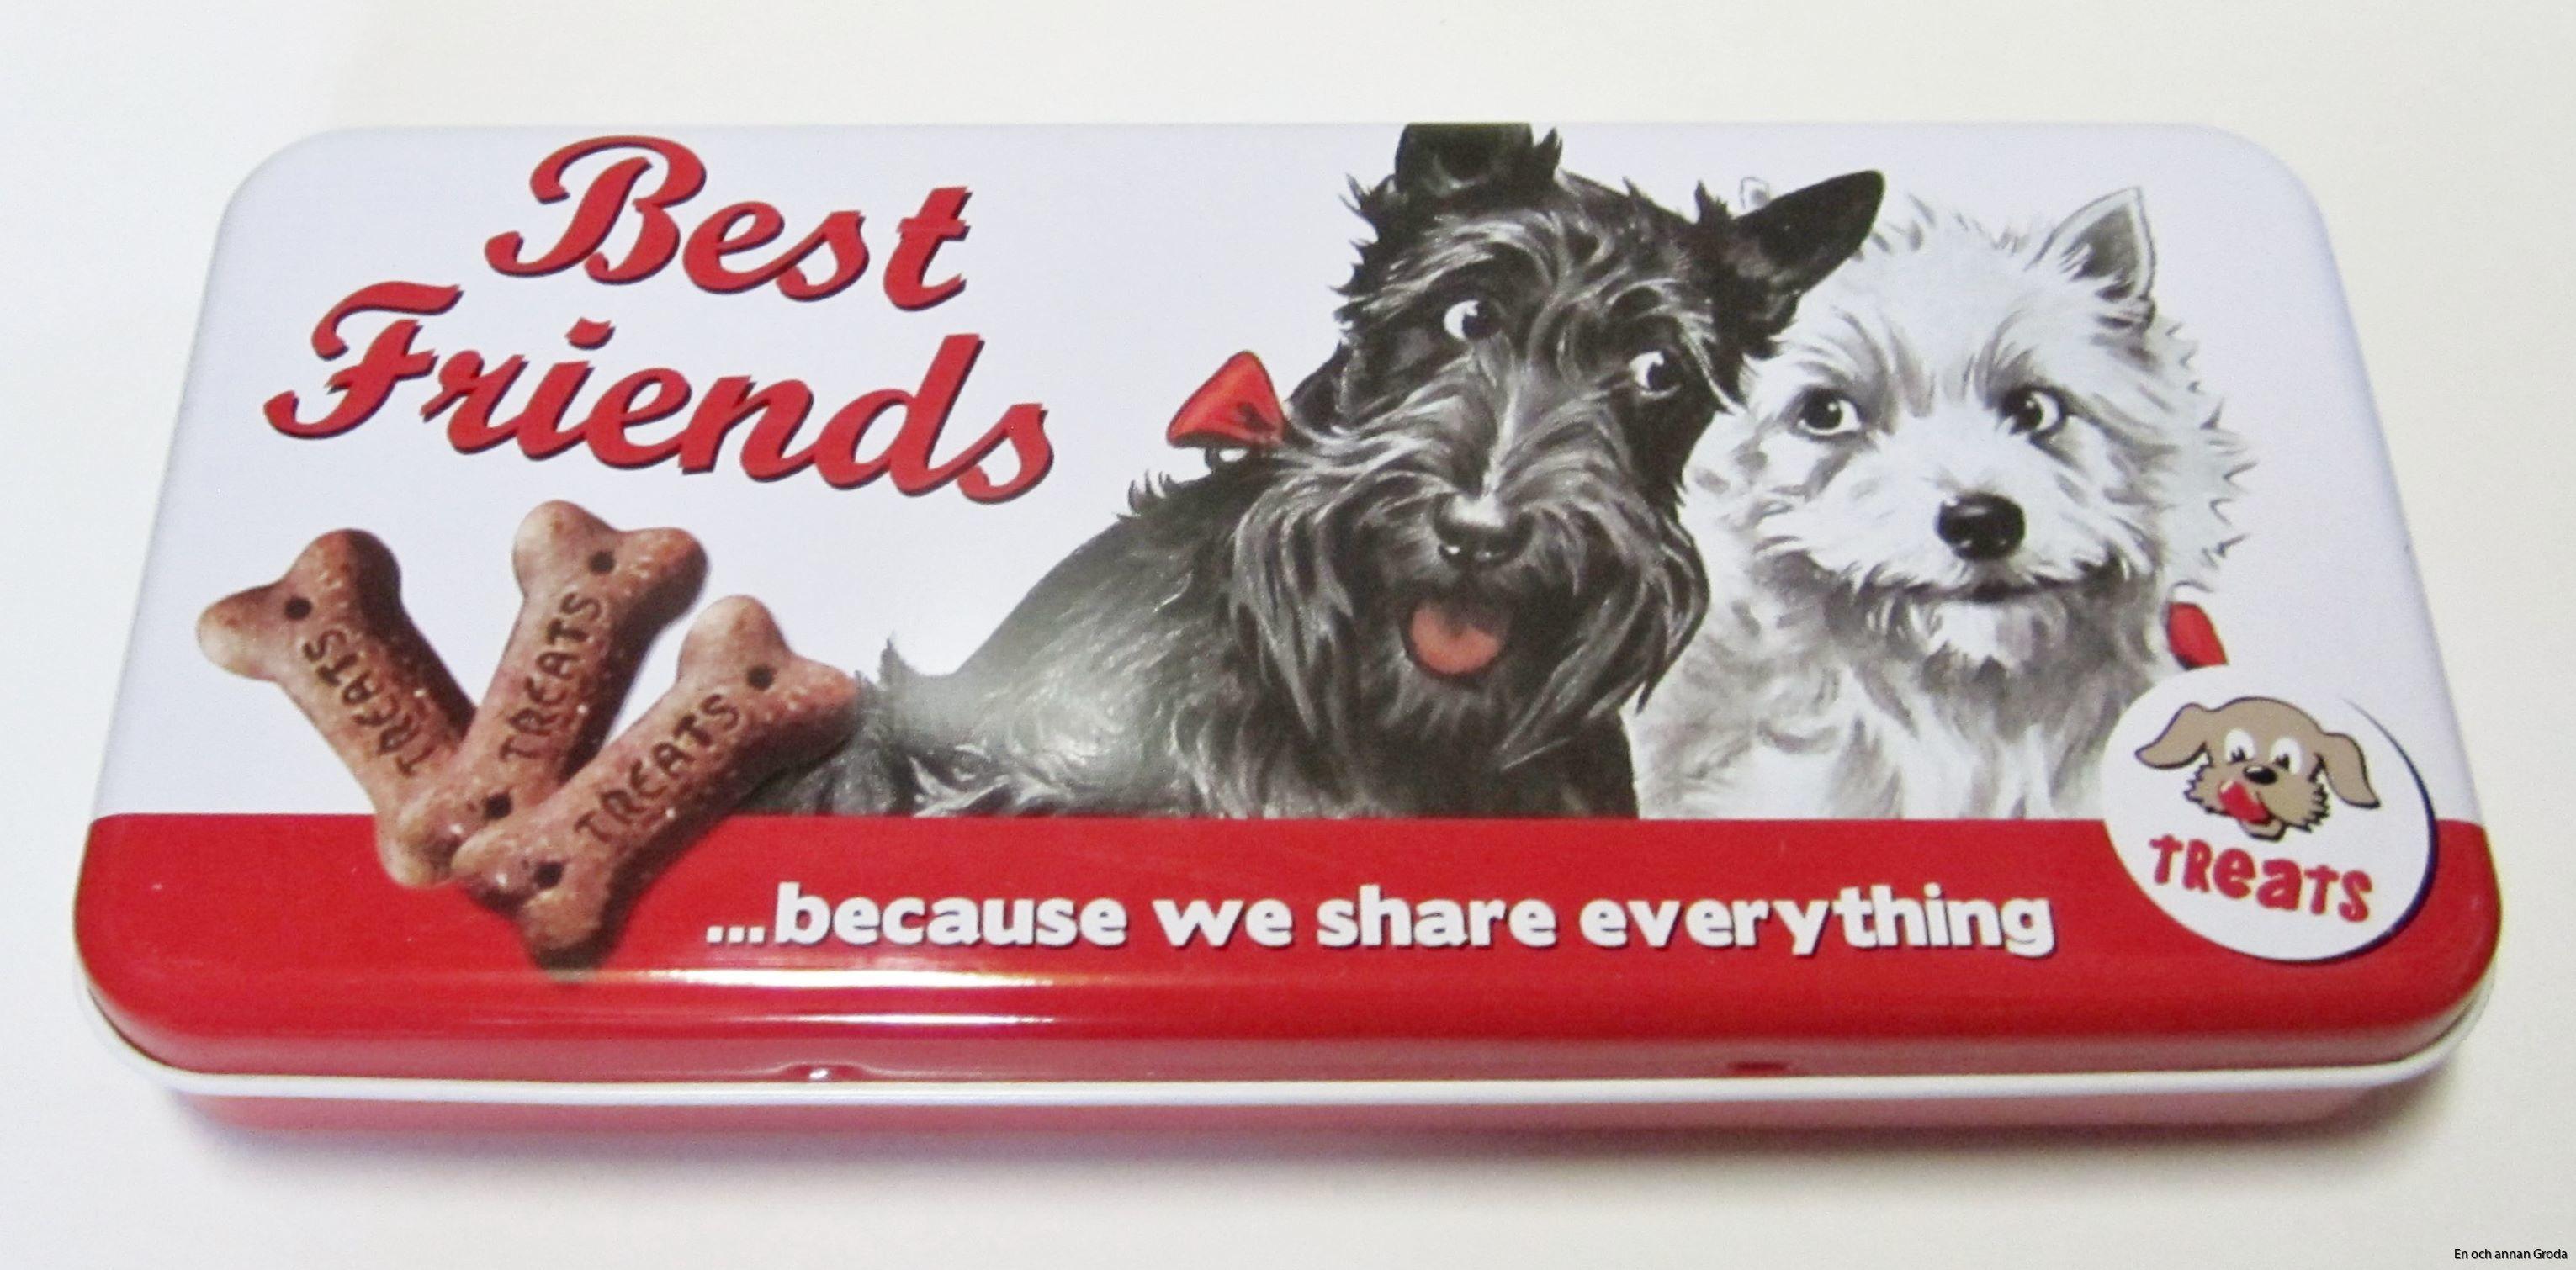 Rea! BURK/SKRIN HUNDAR Best friends ...because we share everything